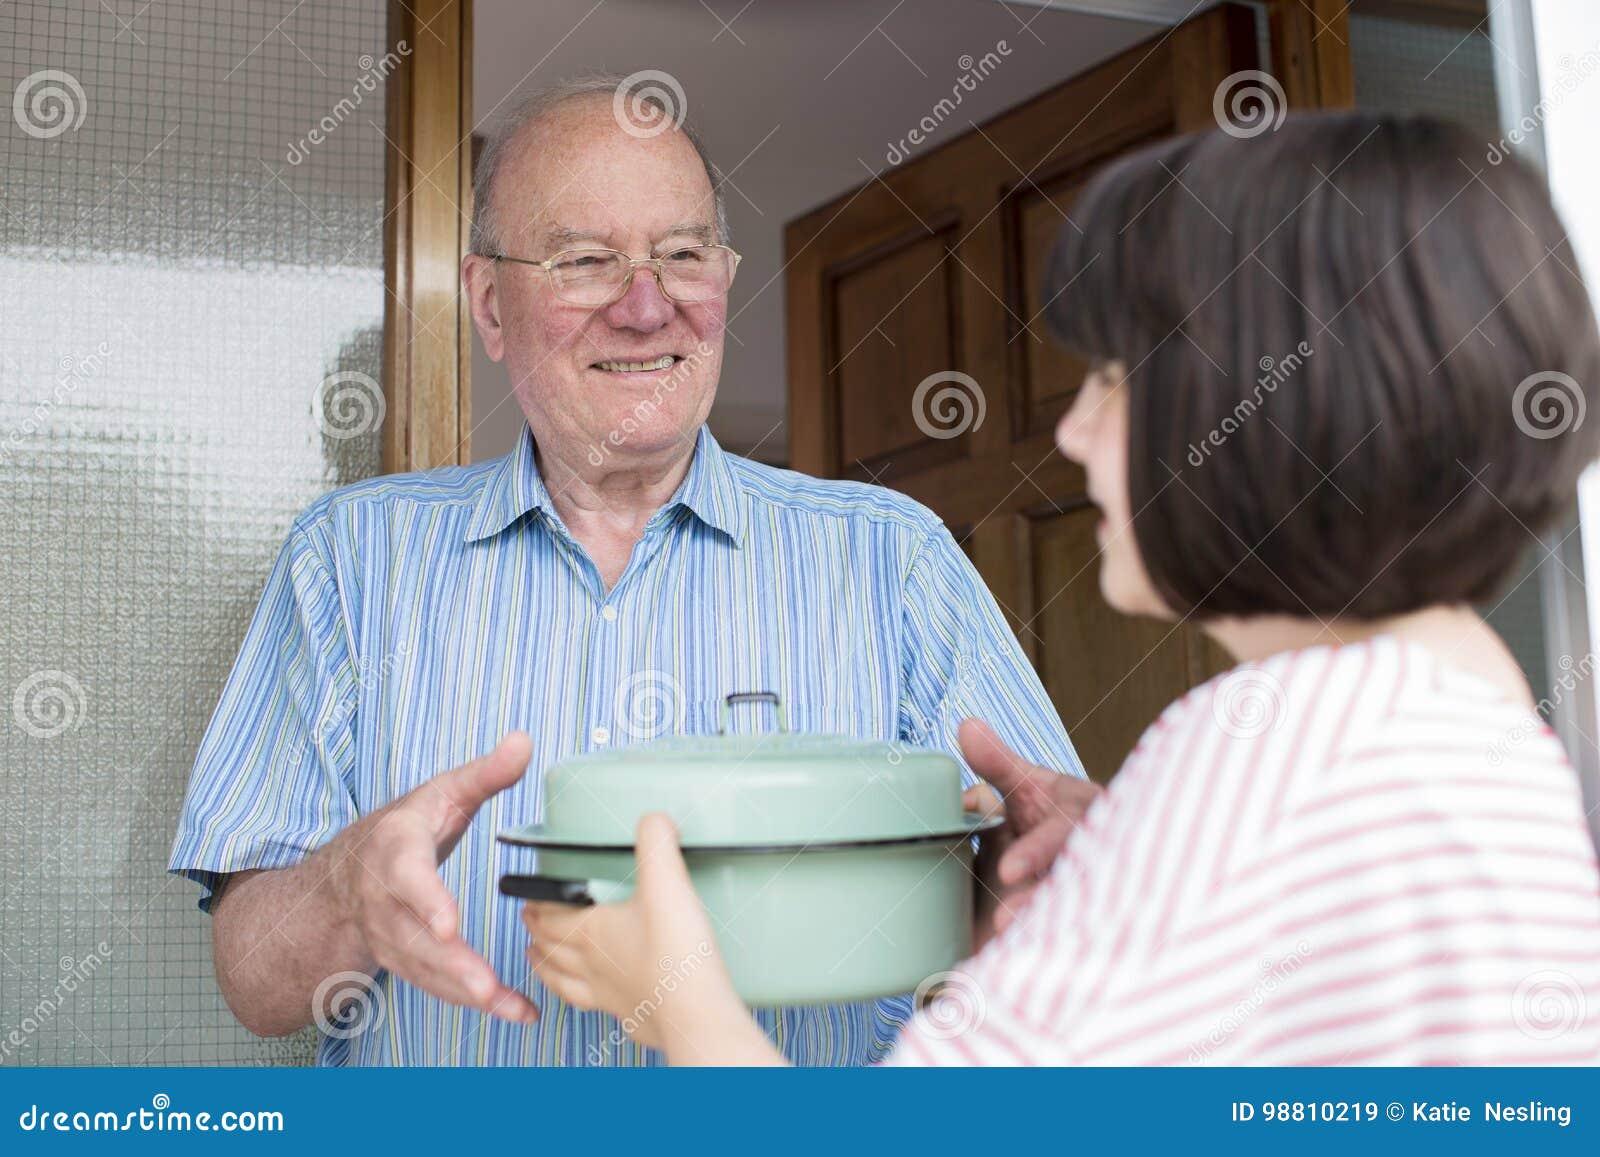 Teenage Girl Bringing Meal For Elderly Male Neighbour